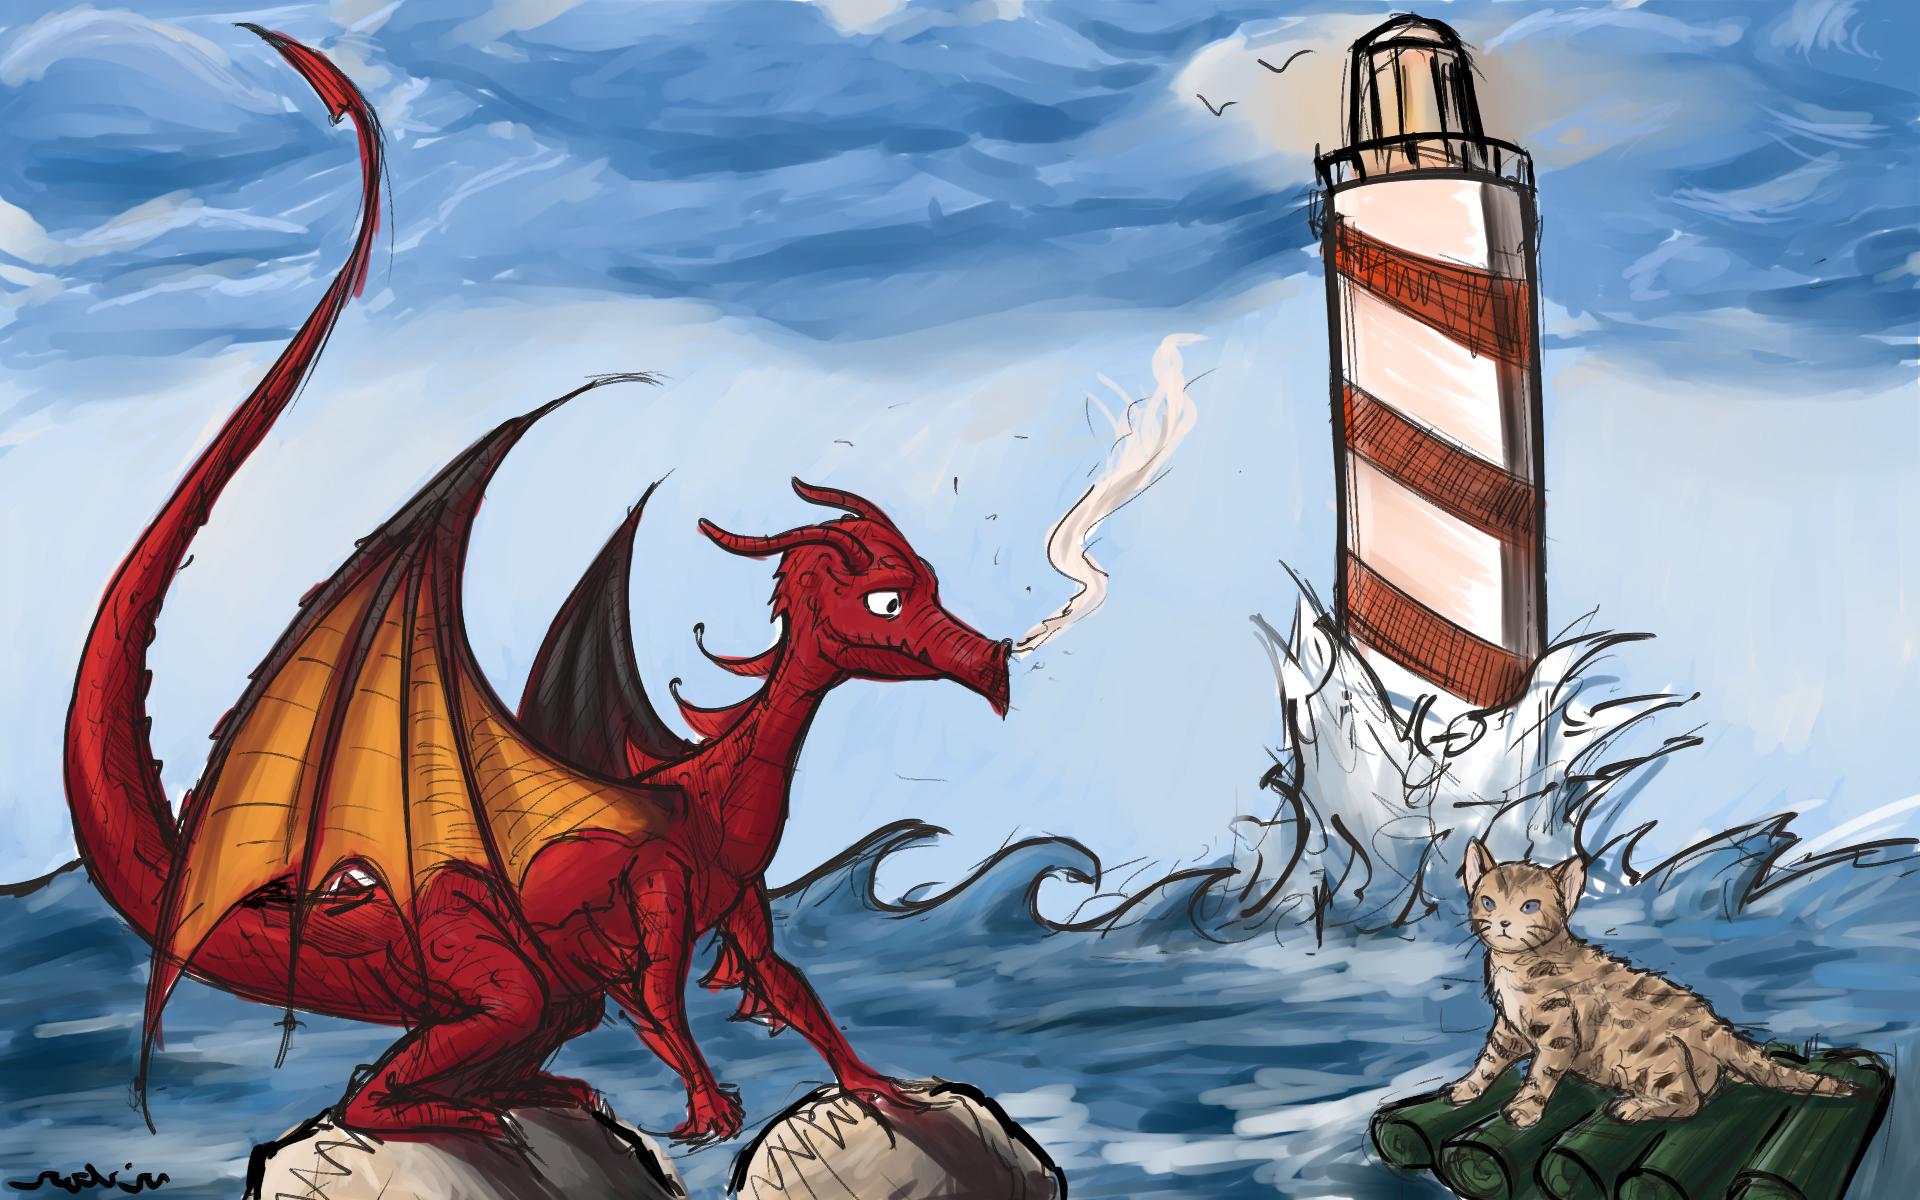 Dragon vs kitty